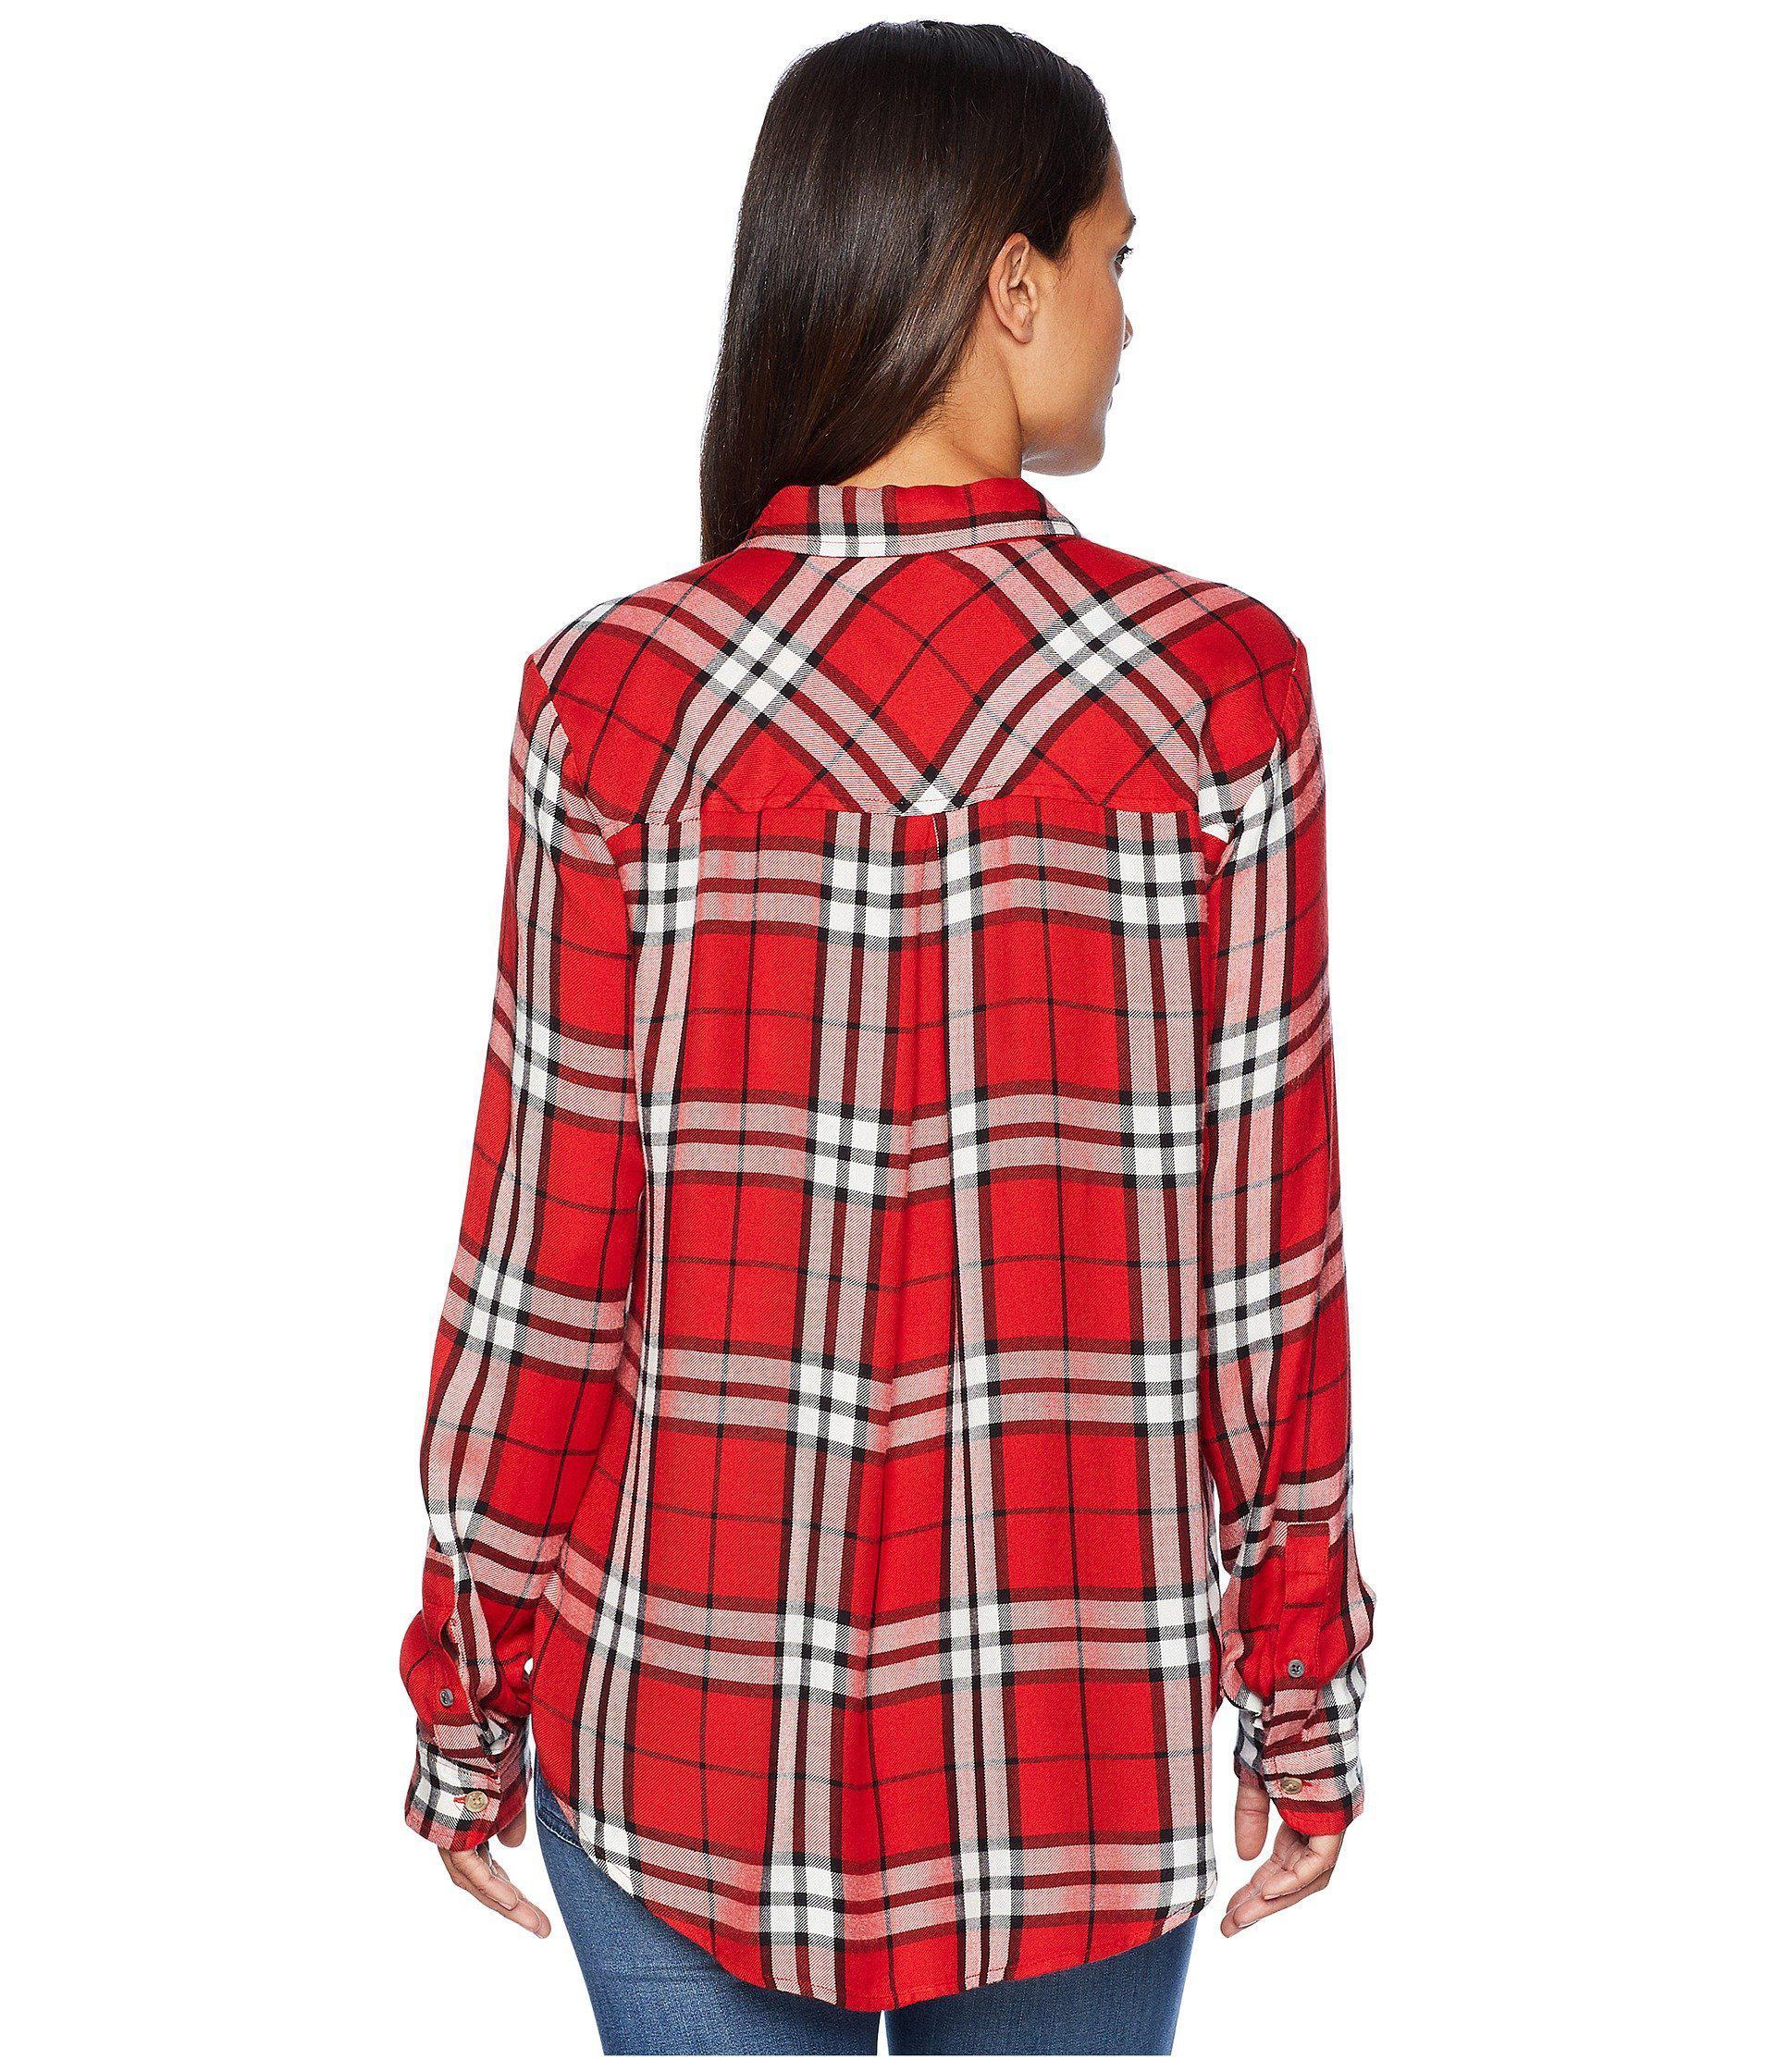 Lucky Brand Womens Boyfriend Plaid Shirt in Red Multi